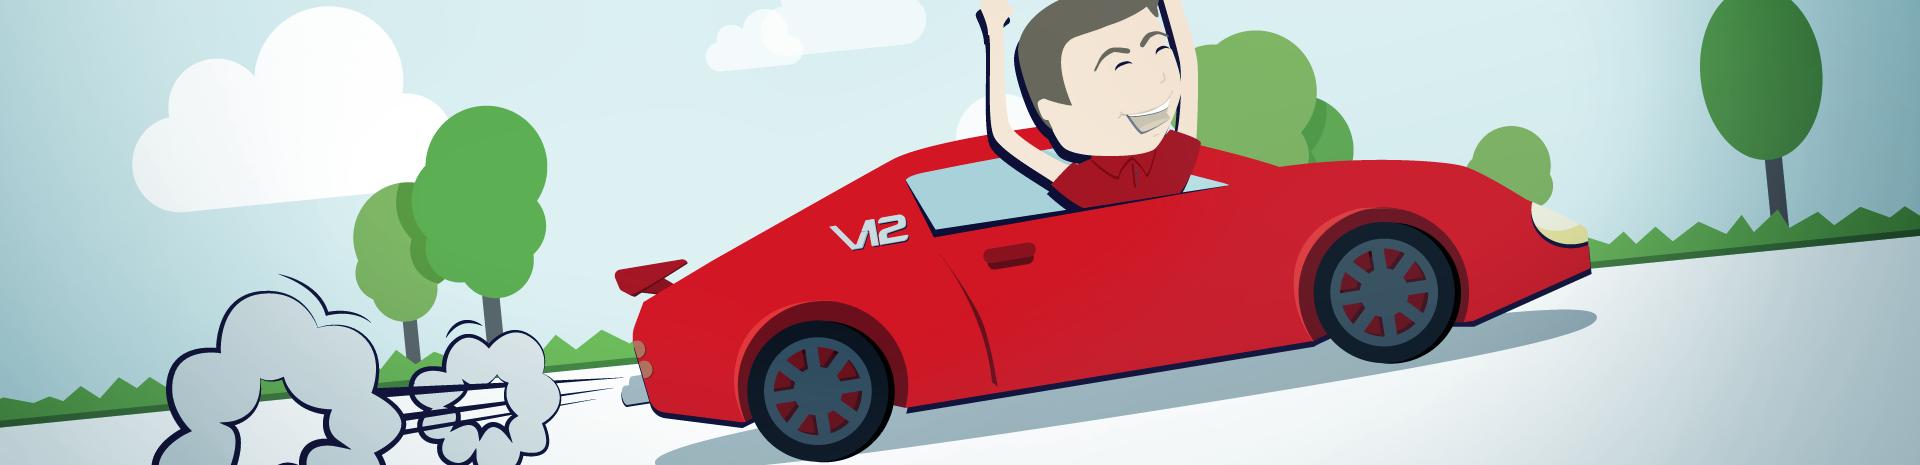 we-are-building-a-car-2-agile-methodology